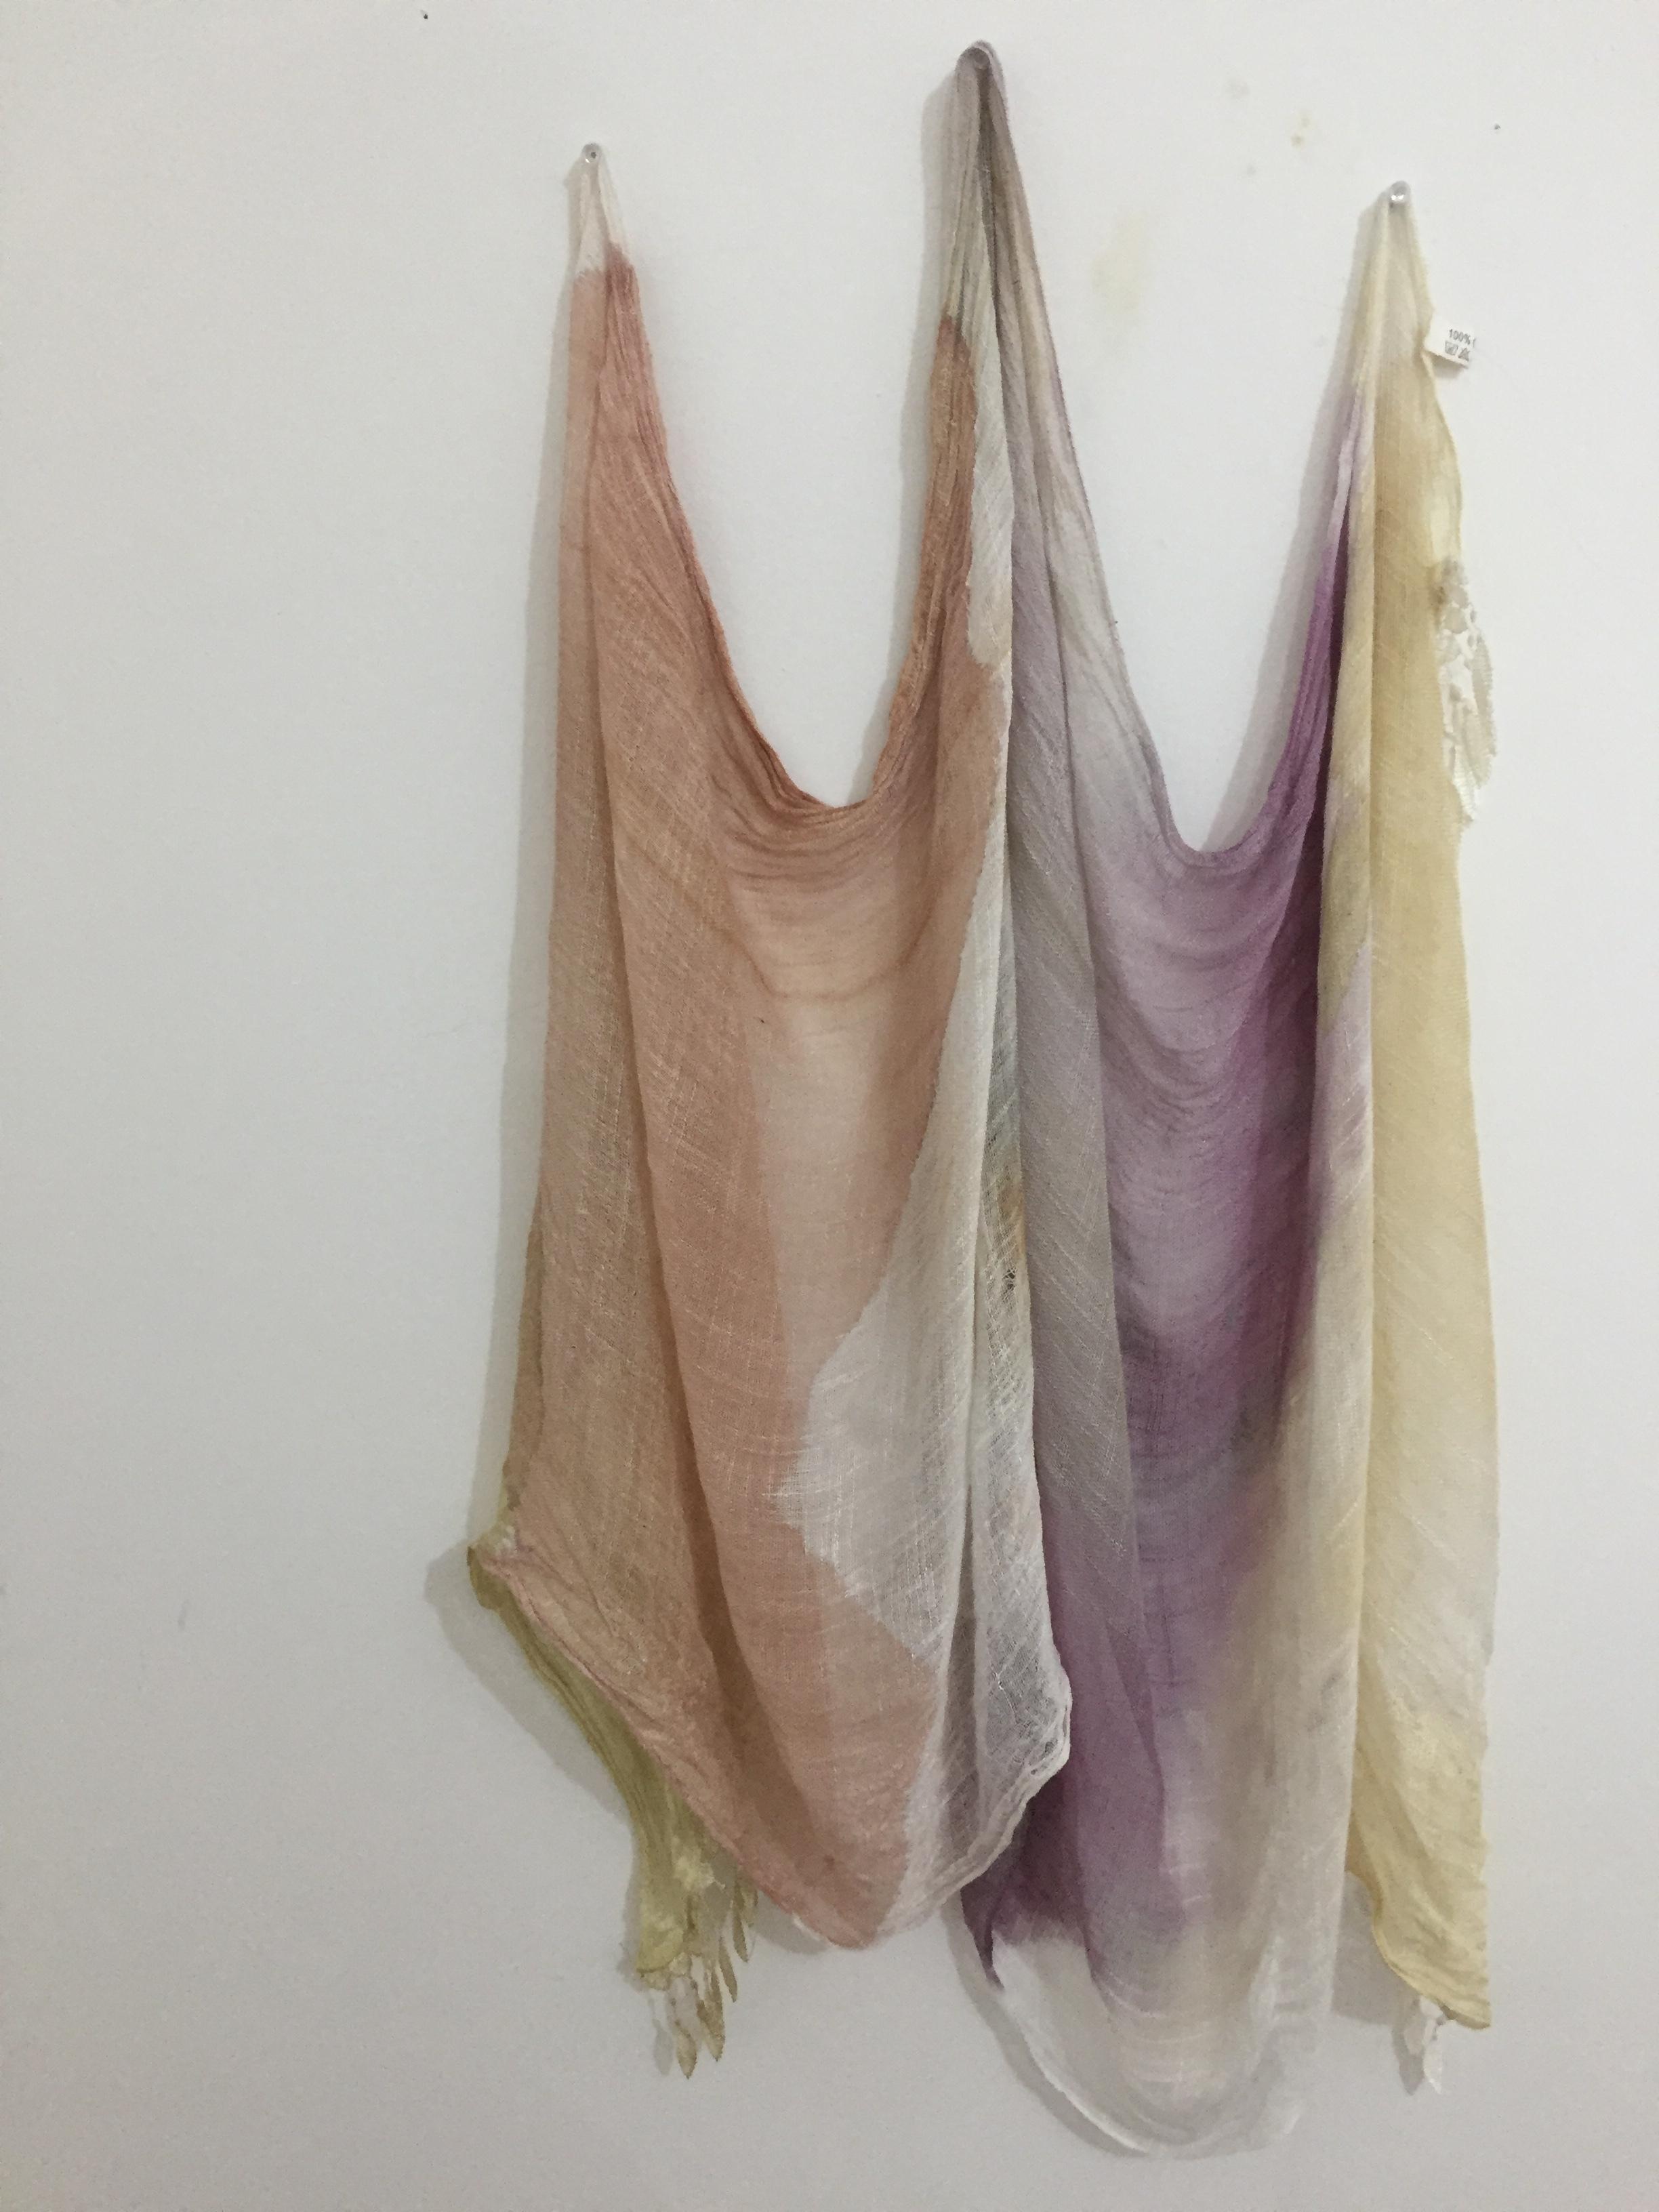 Natural Dye on cotton -